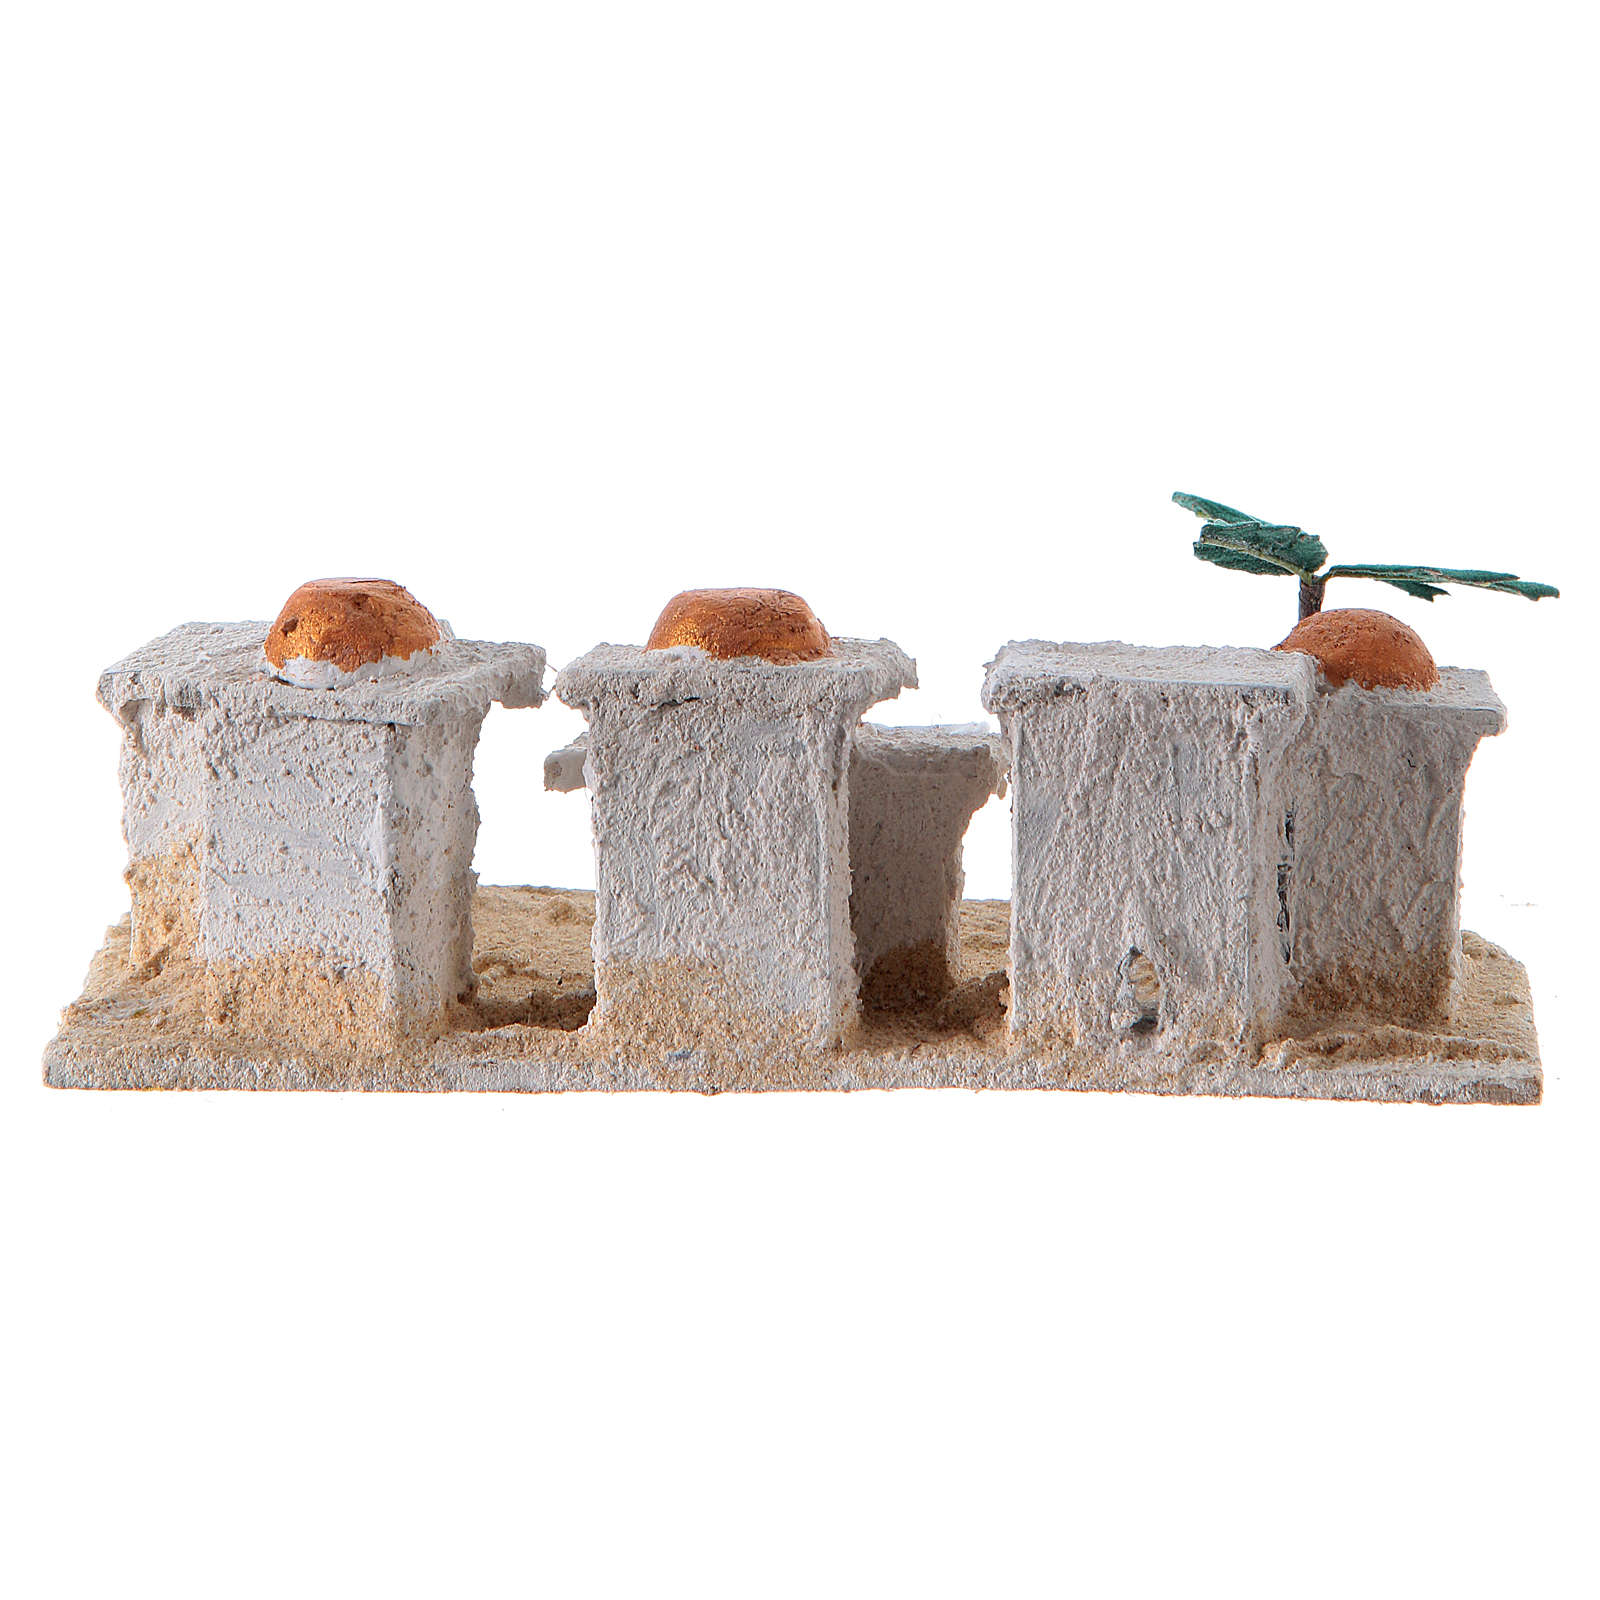 Nativity Arabian houses 8x15x10cm, assorted models 4